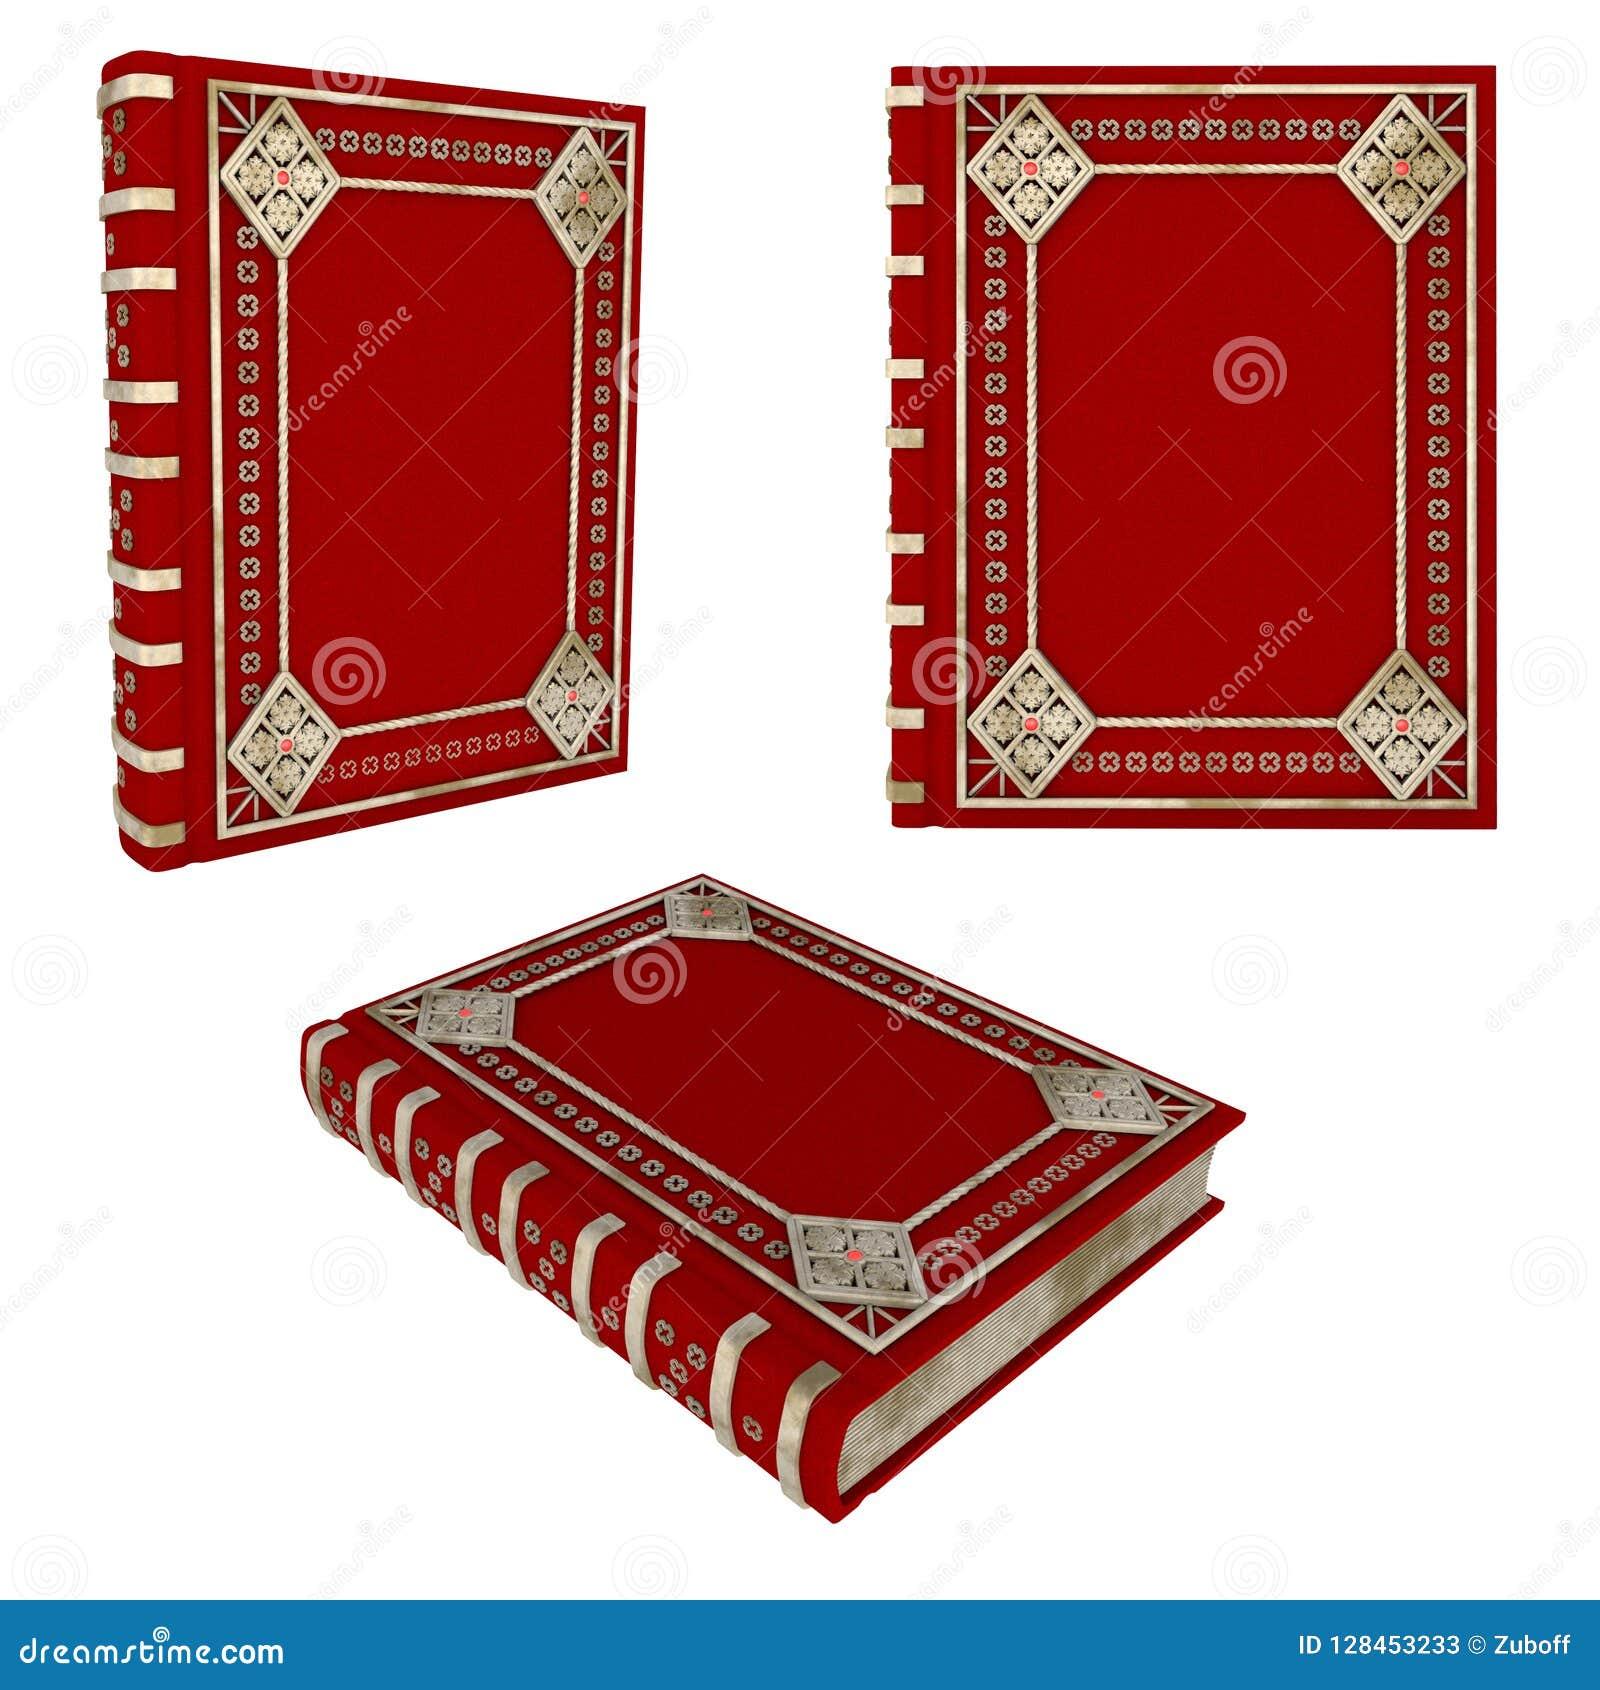 Schönes rotes Buch